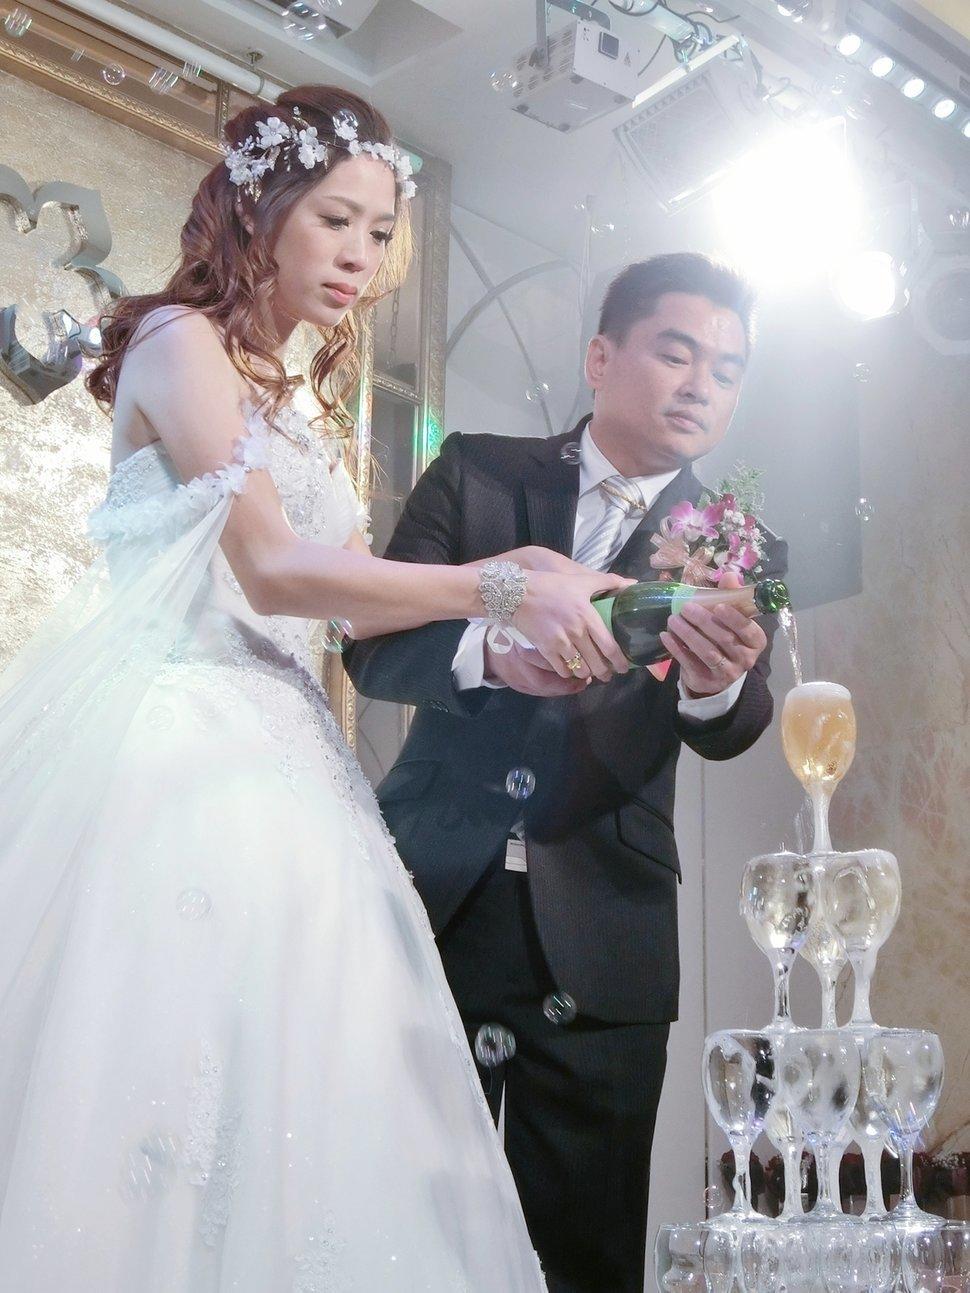 CIMG8062_mh1512617721163 - 盈曲新娘造型設計 - 結婚吧